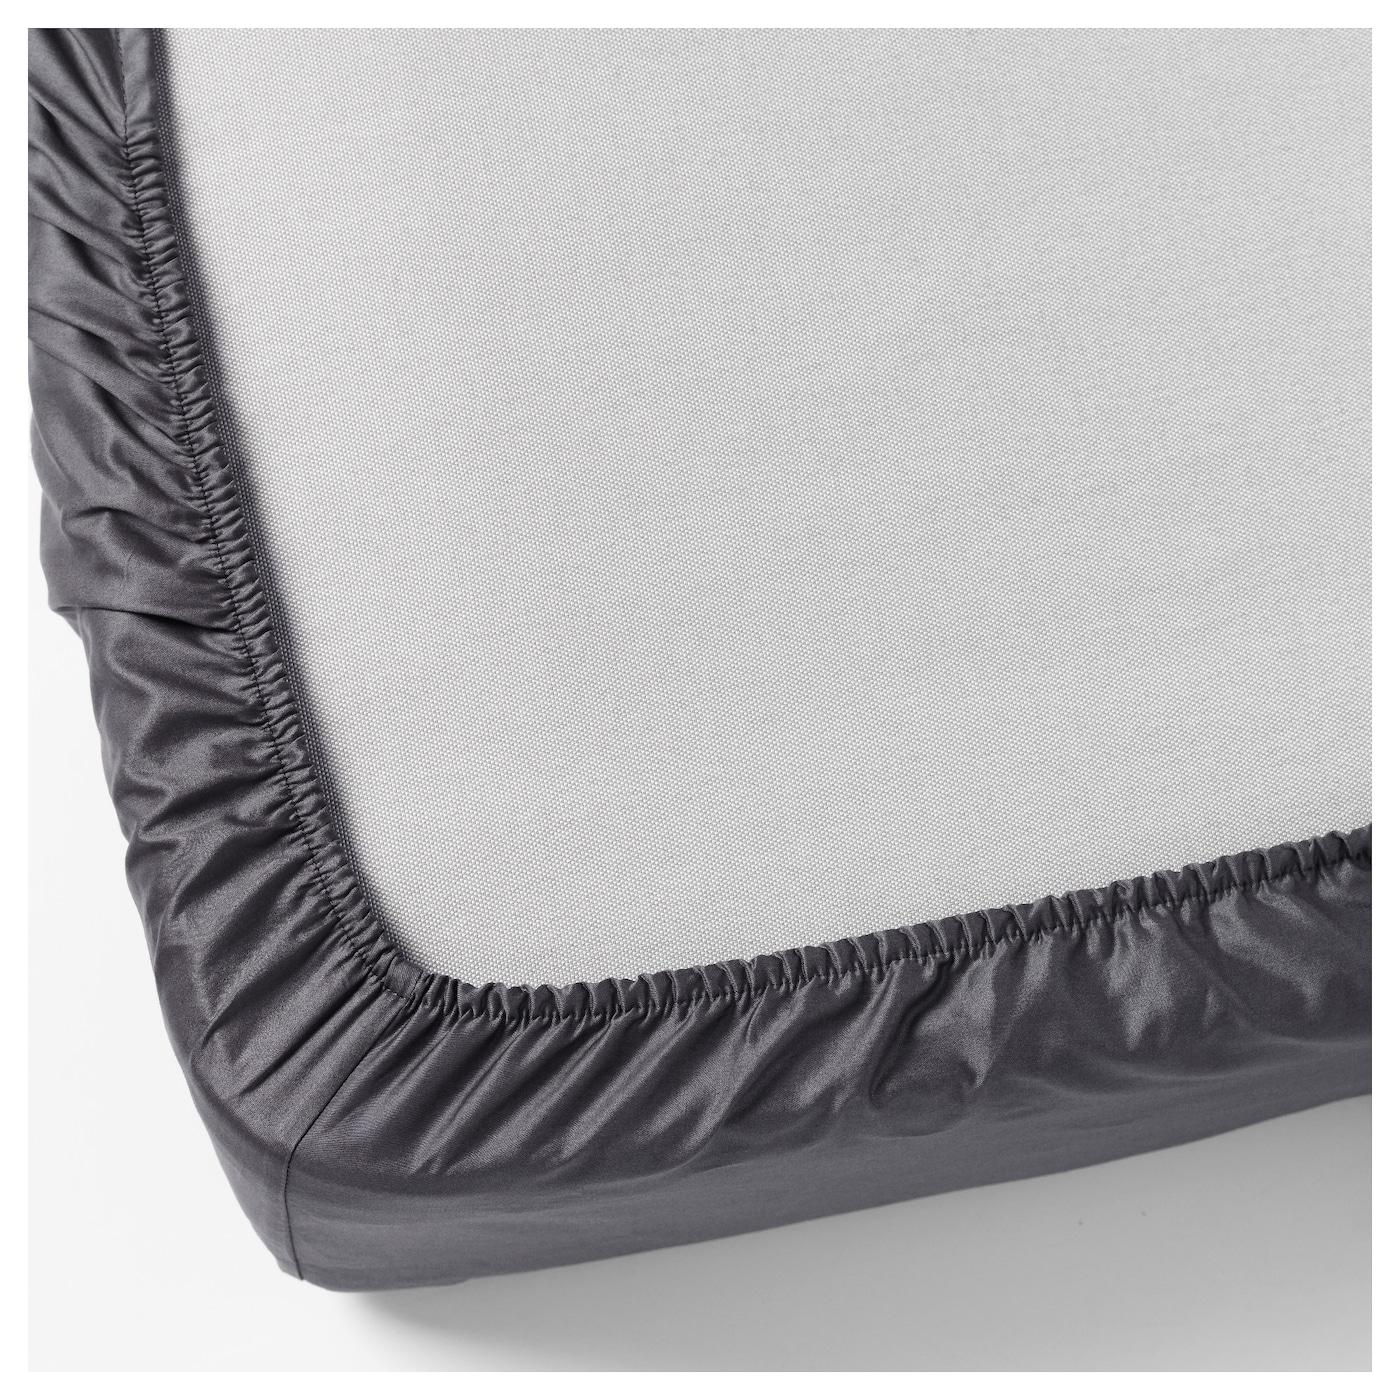 g spa fitted sheet dark grey 140x200 cm ikea. Black Bedroom Furniture Sets. Home Design Ideas